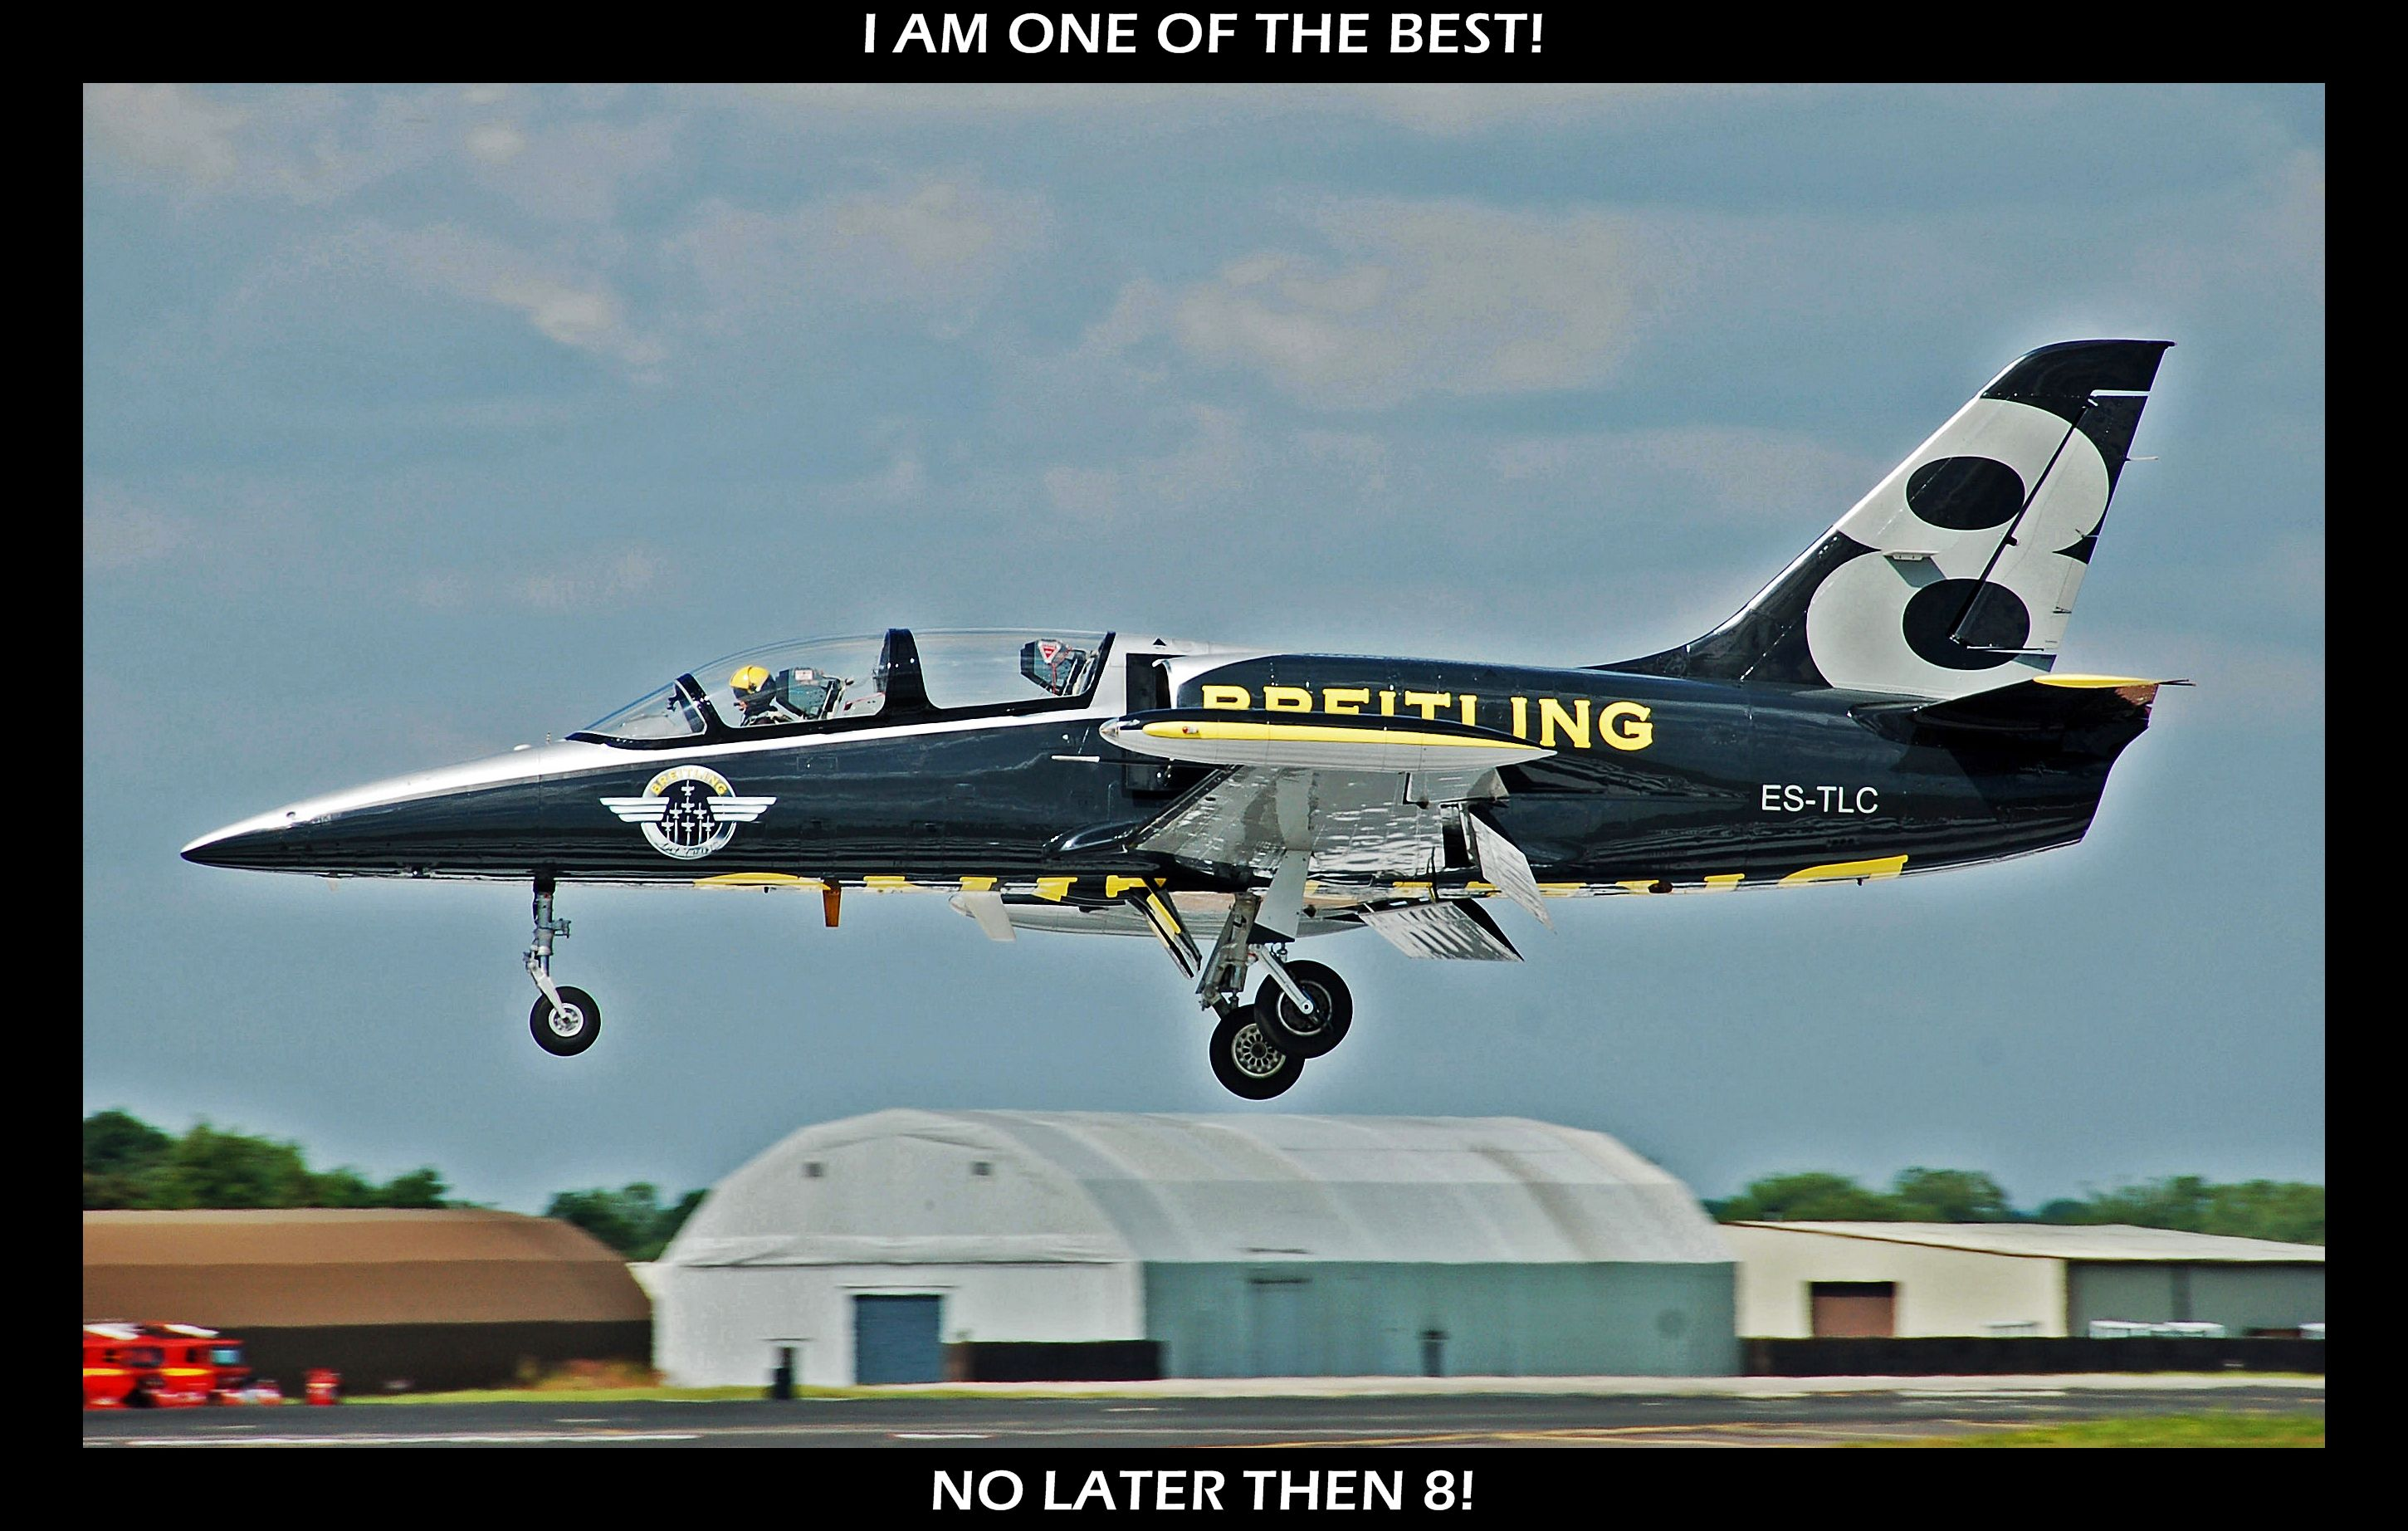 529eaf99731f844bb1b1fec86534bb34 aircraft meme 3 by hellomon100 deviantart com on @deviantart,Funny Meme Manufacturing Airplanes